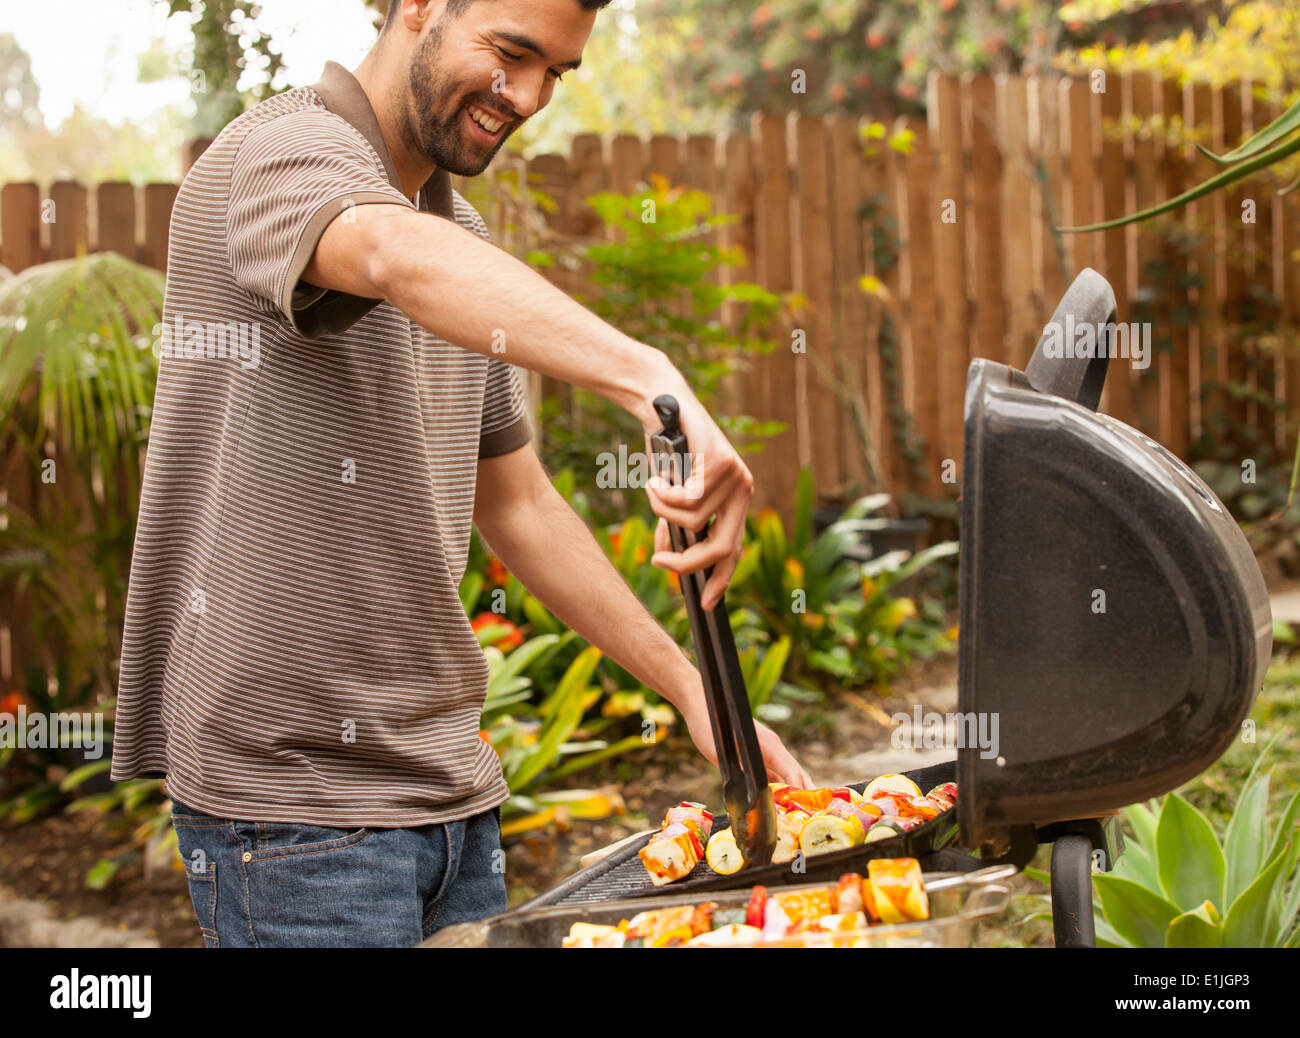 cooking stockfotos cooking bilder alamy. Black Bedroom Furniture Sets. Home Design Ideas